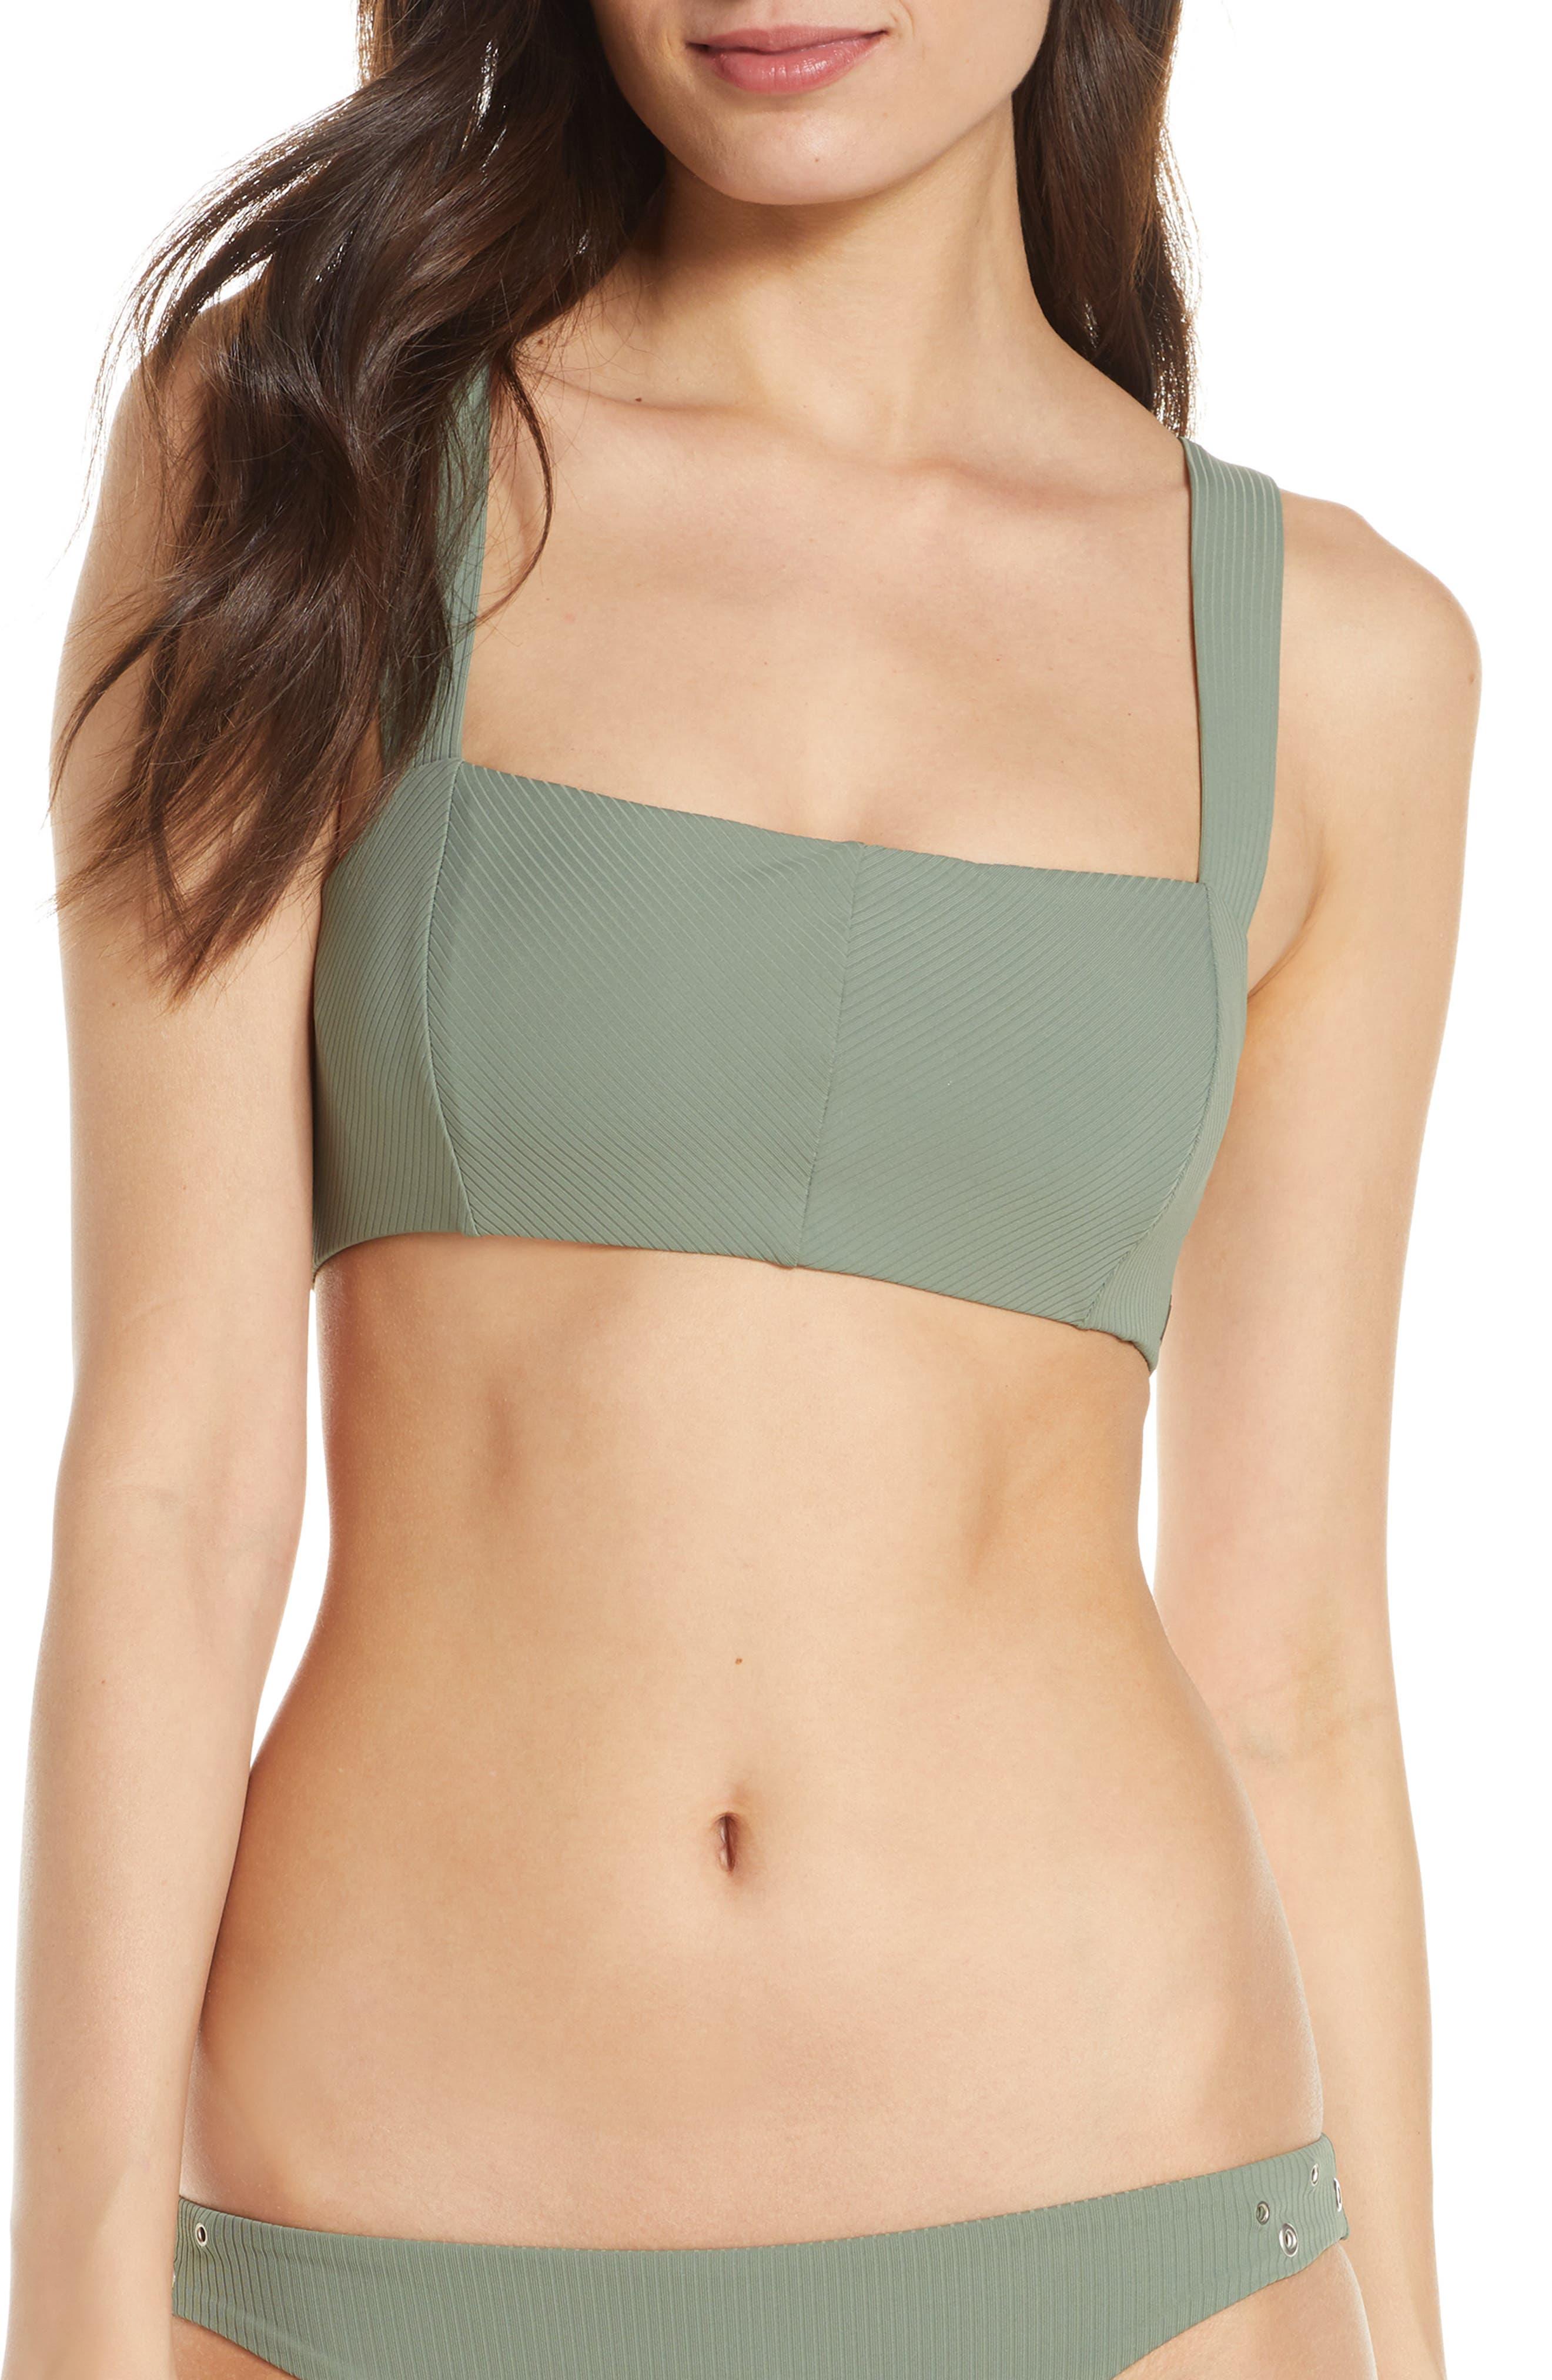 Hurley Quick Dry Surf Bikini Top